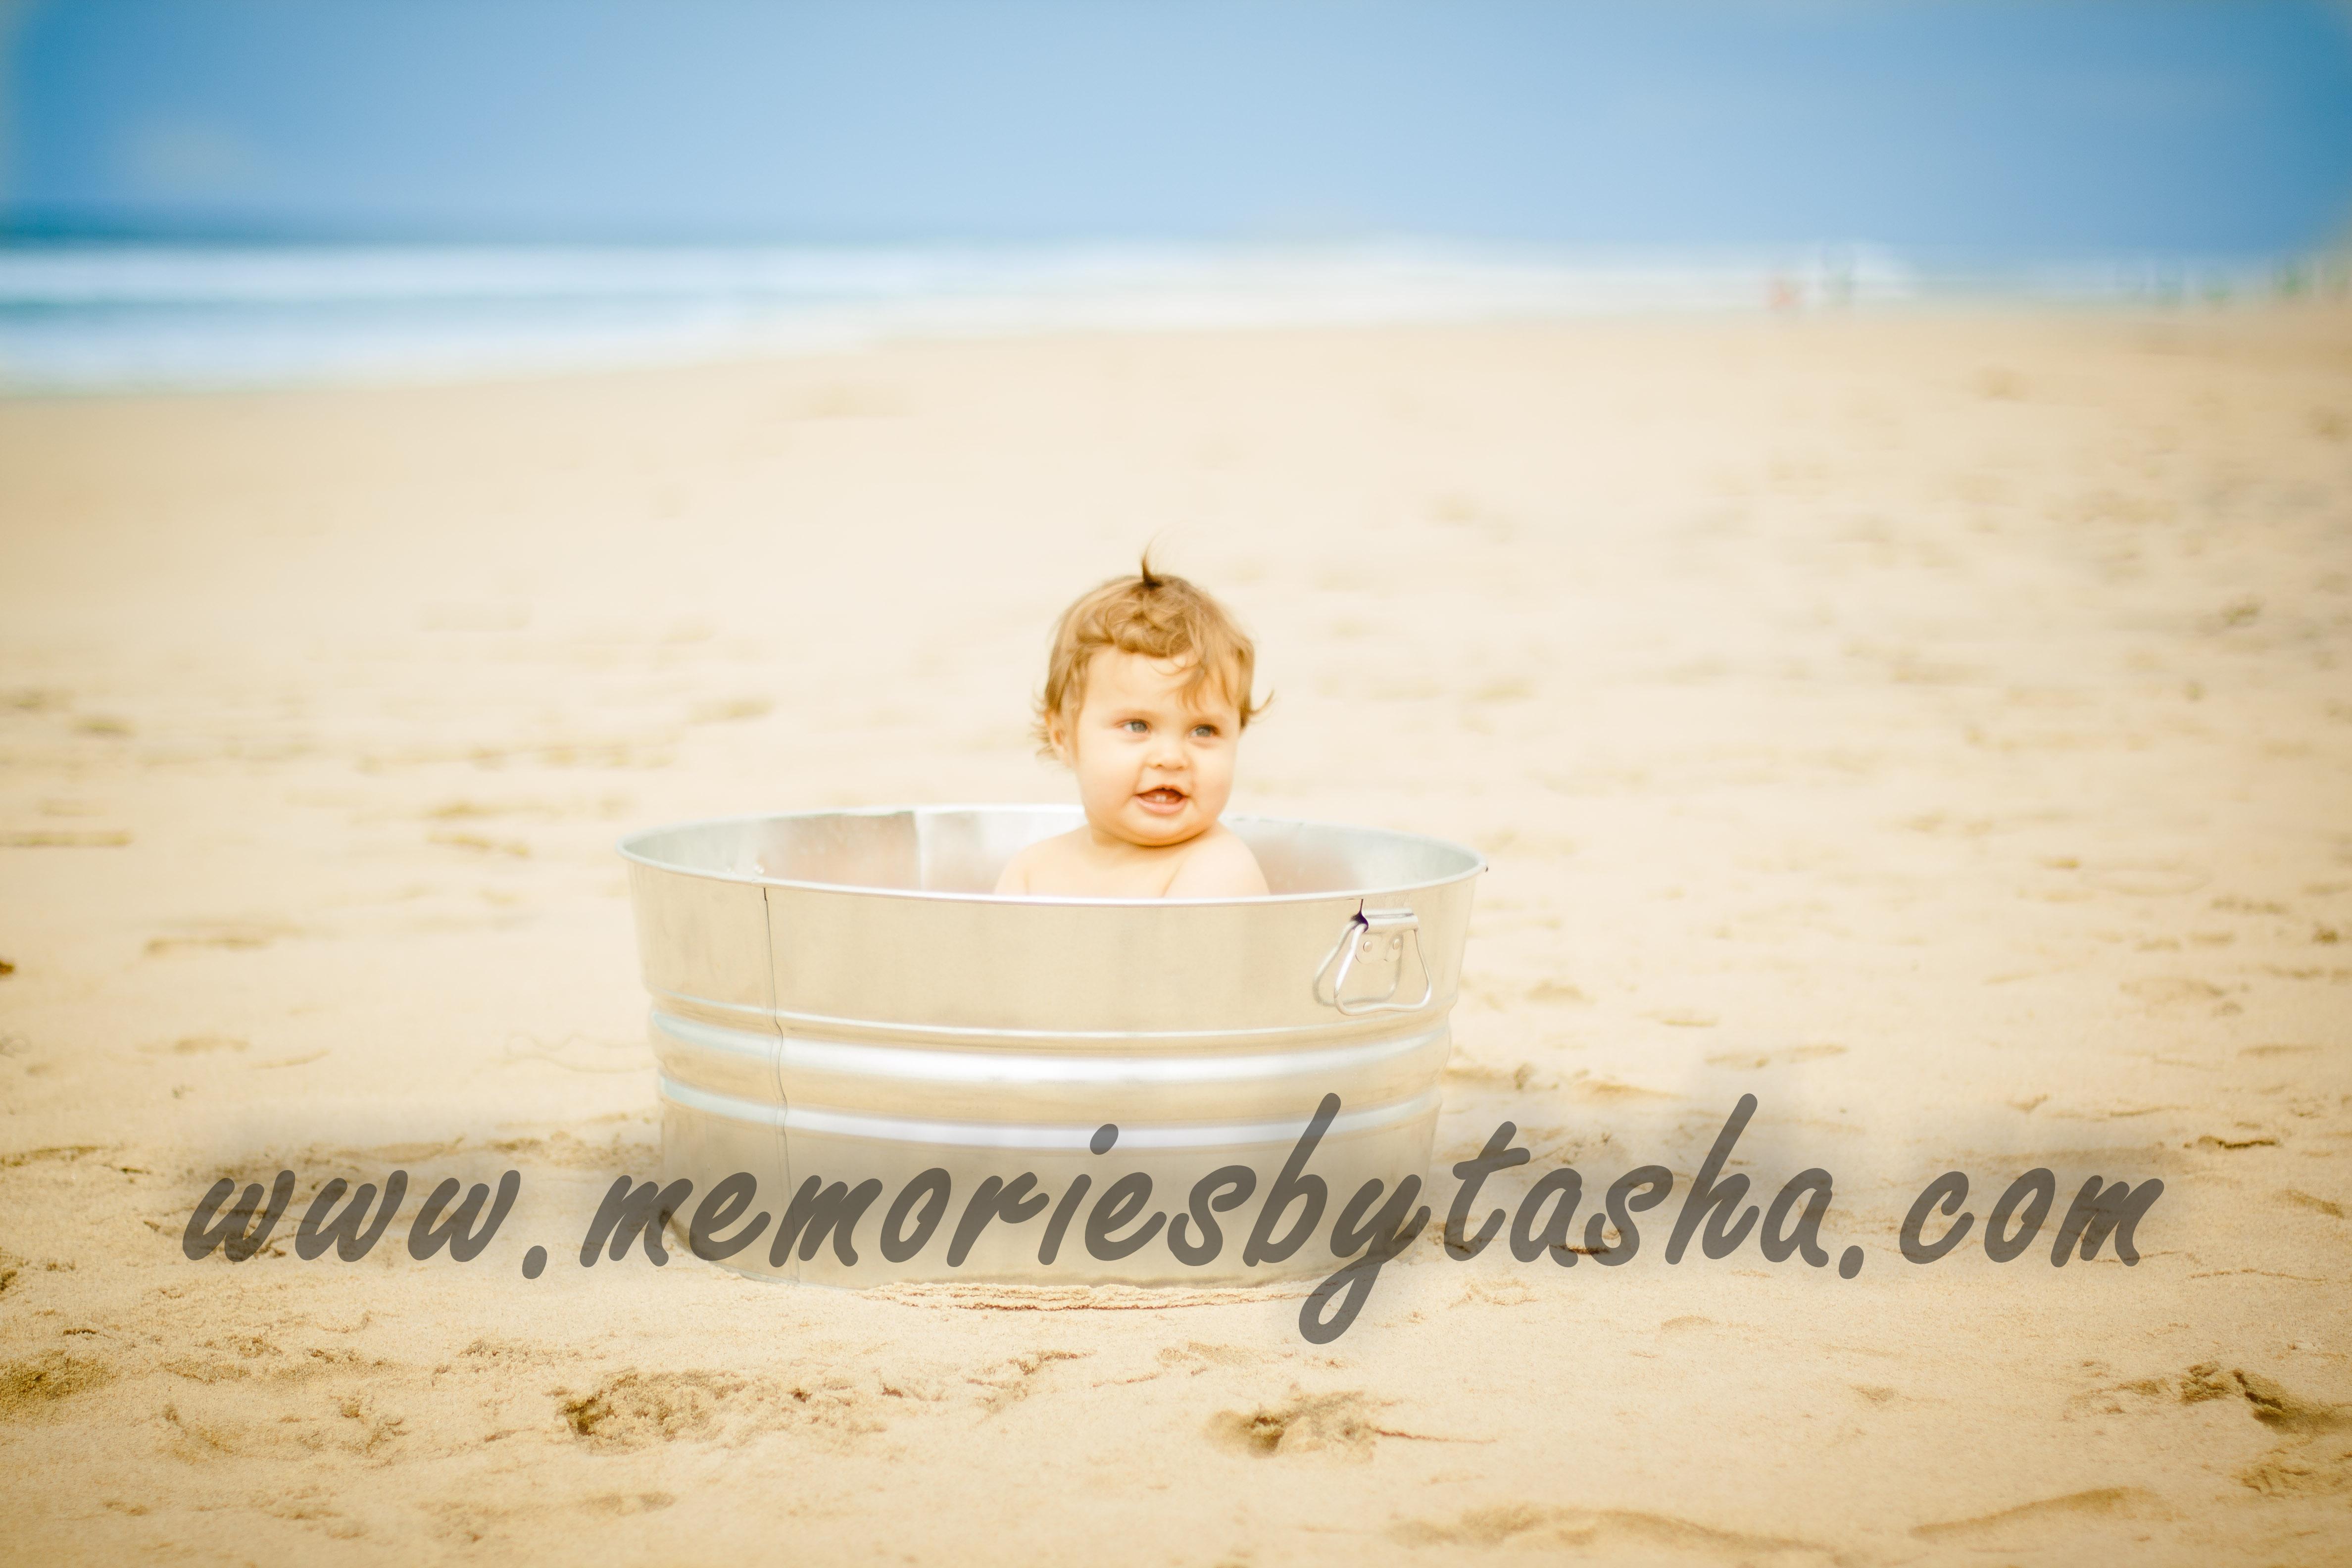 April 2013 – Memories by Tasha Photography